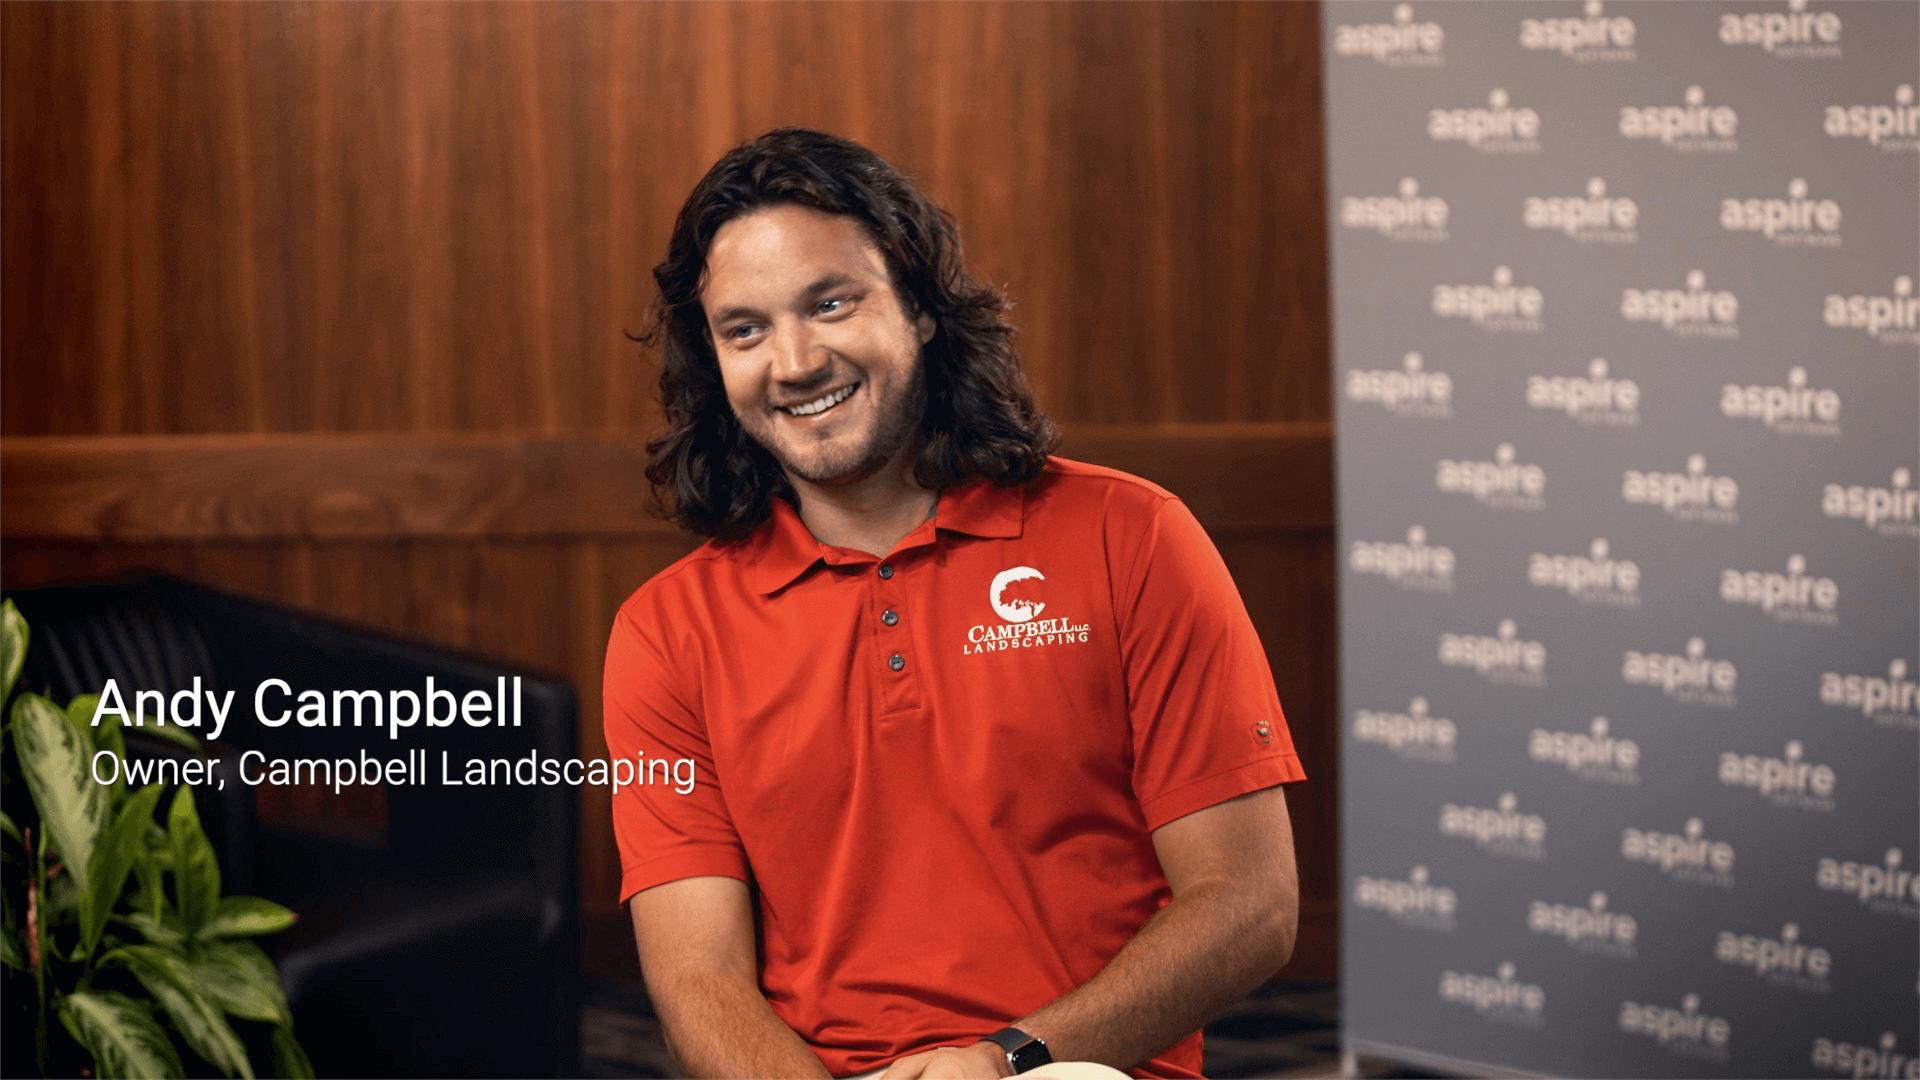 Aspire + Campbell Landscaping: Customer testimonial